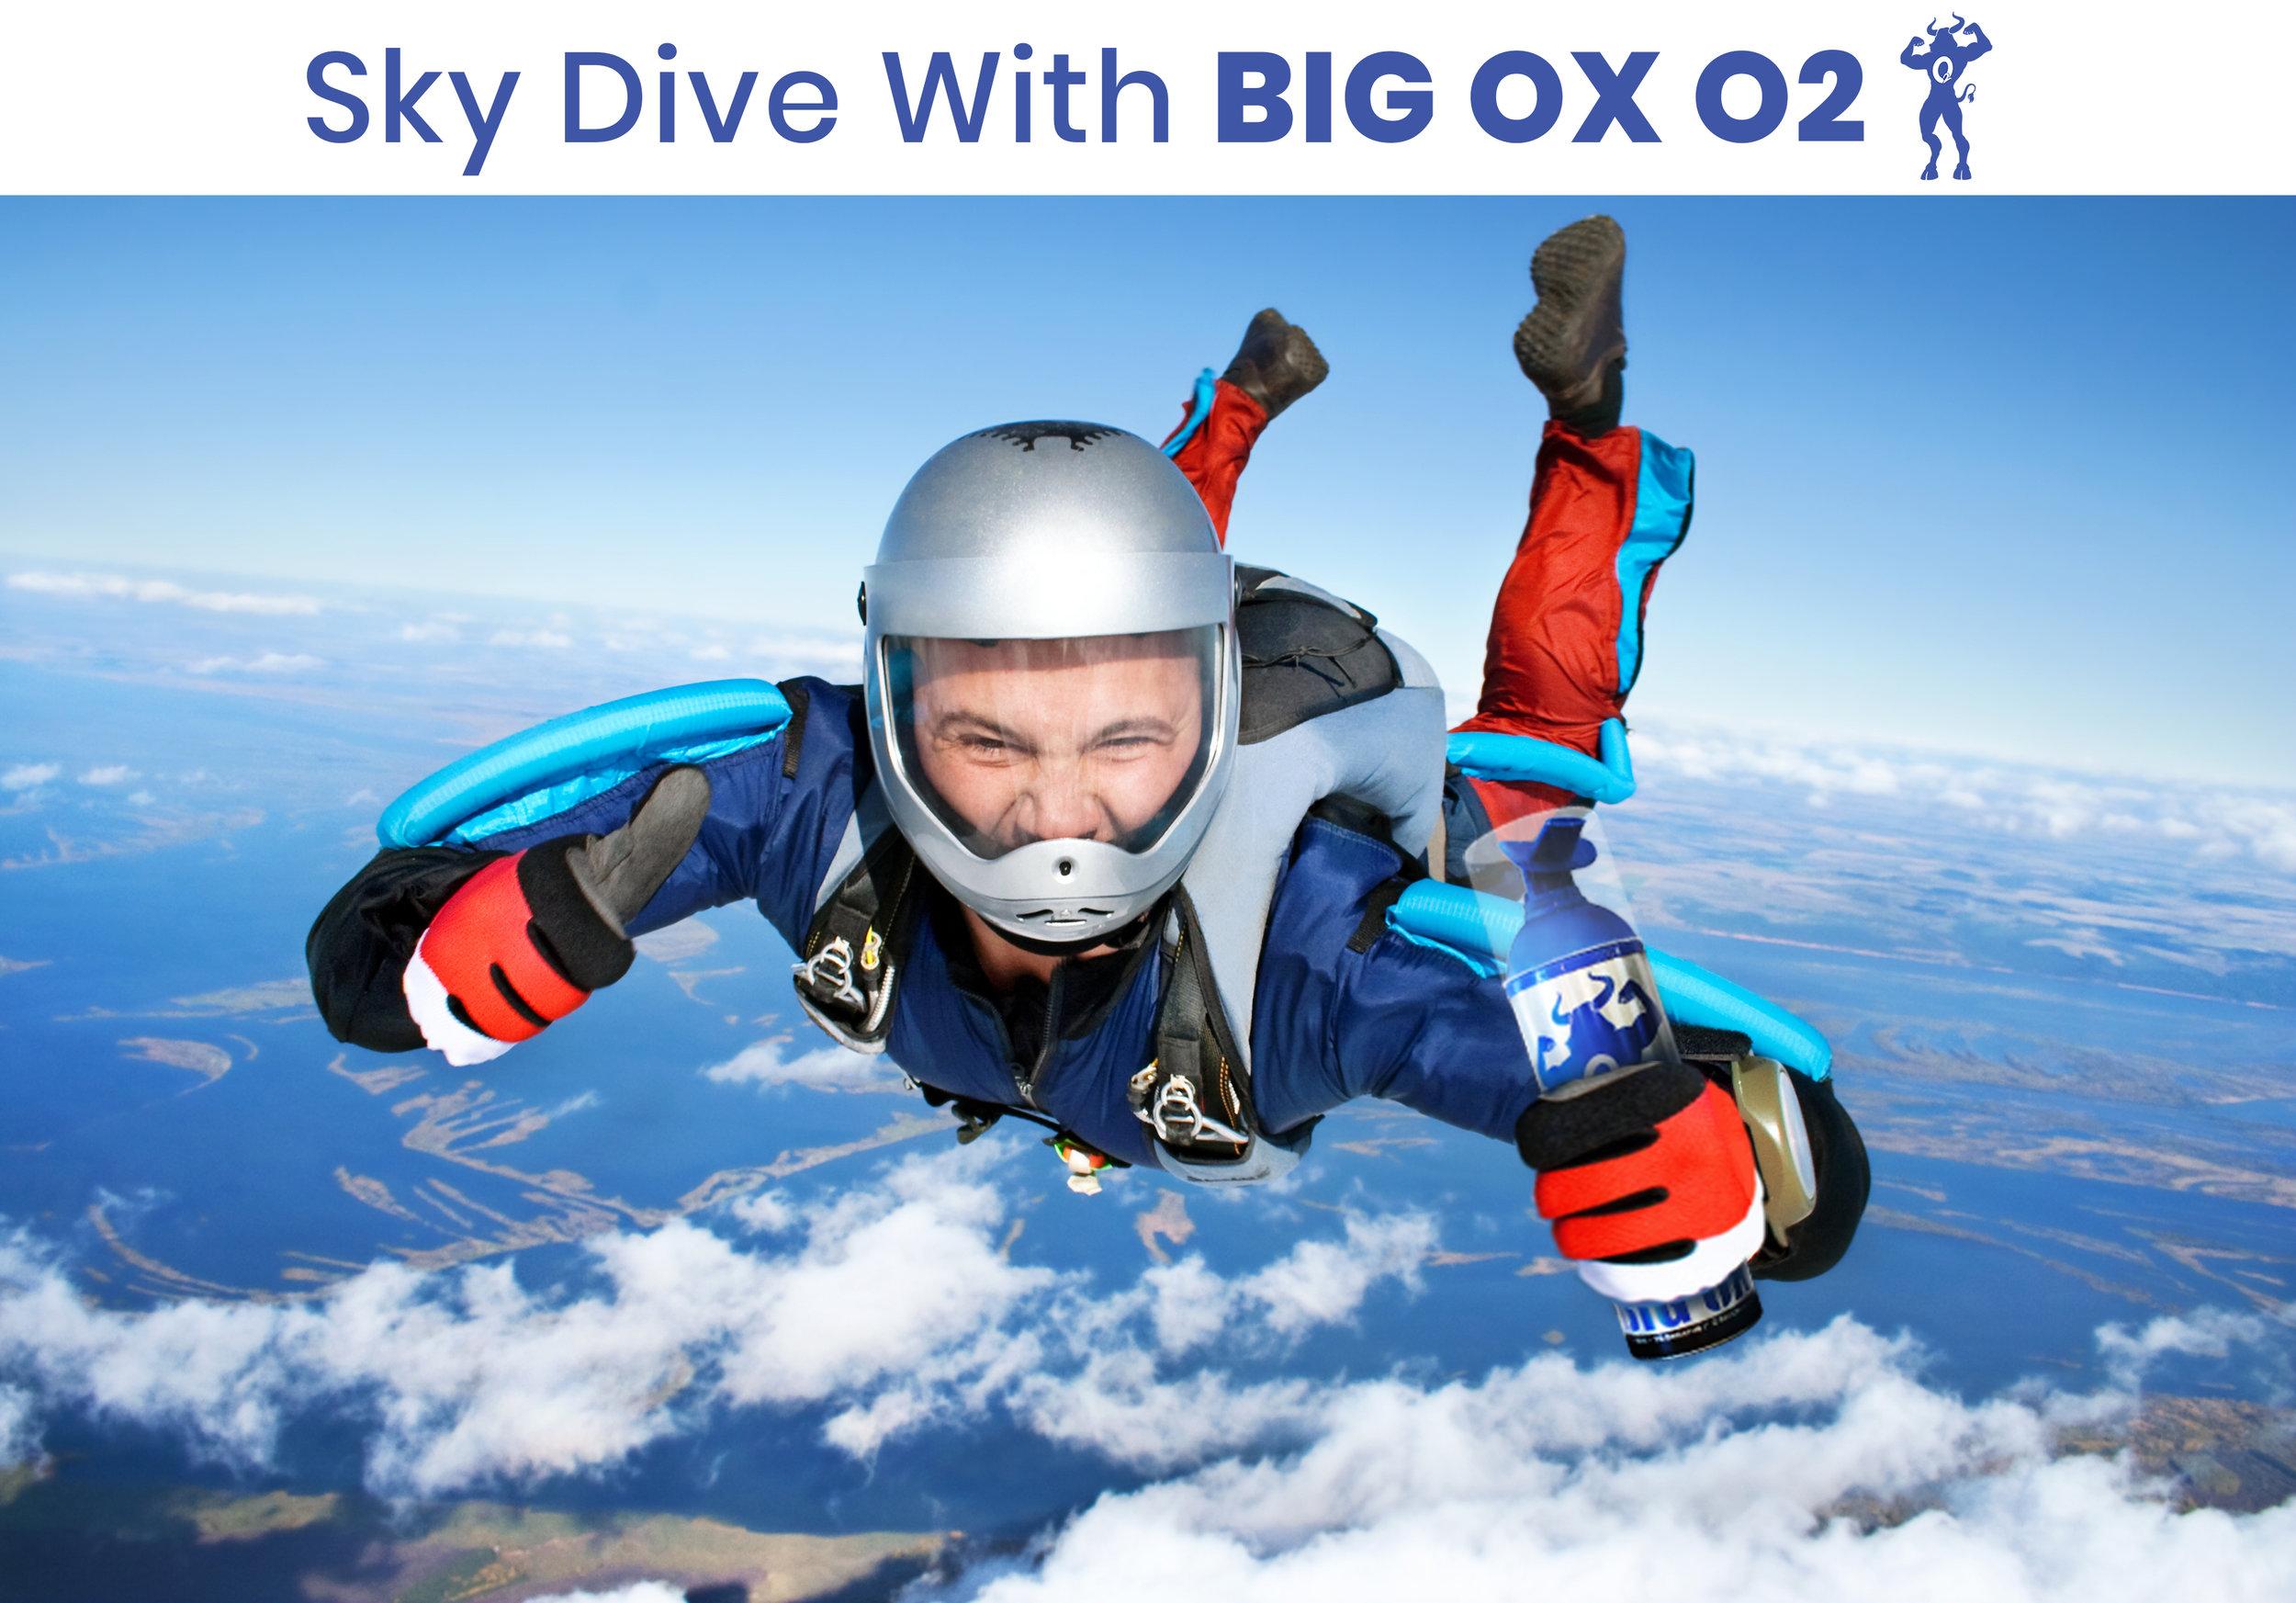 SkyDiveBigOX.jpg